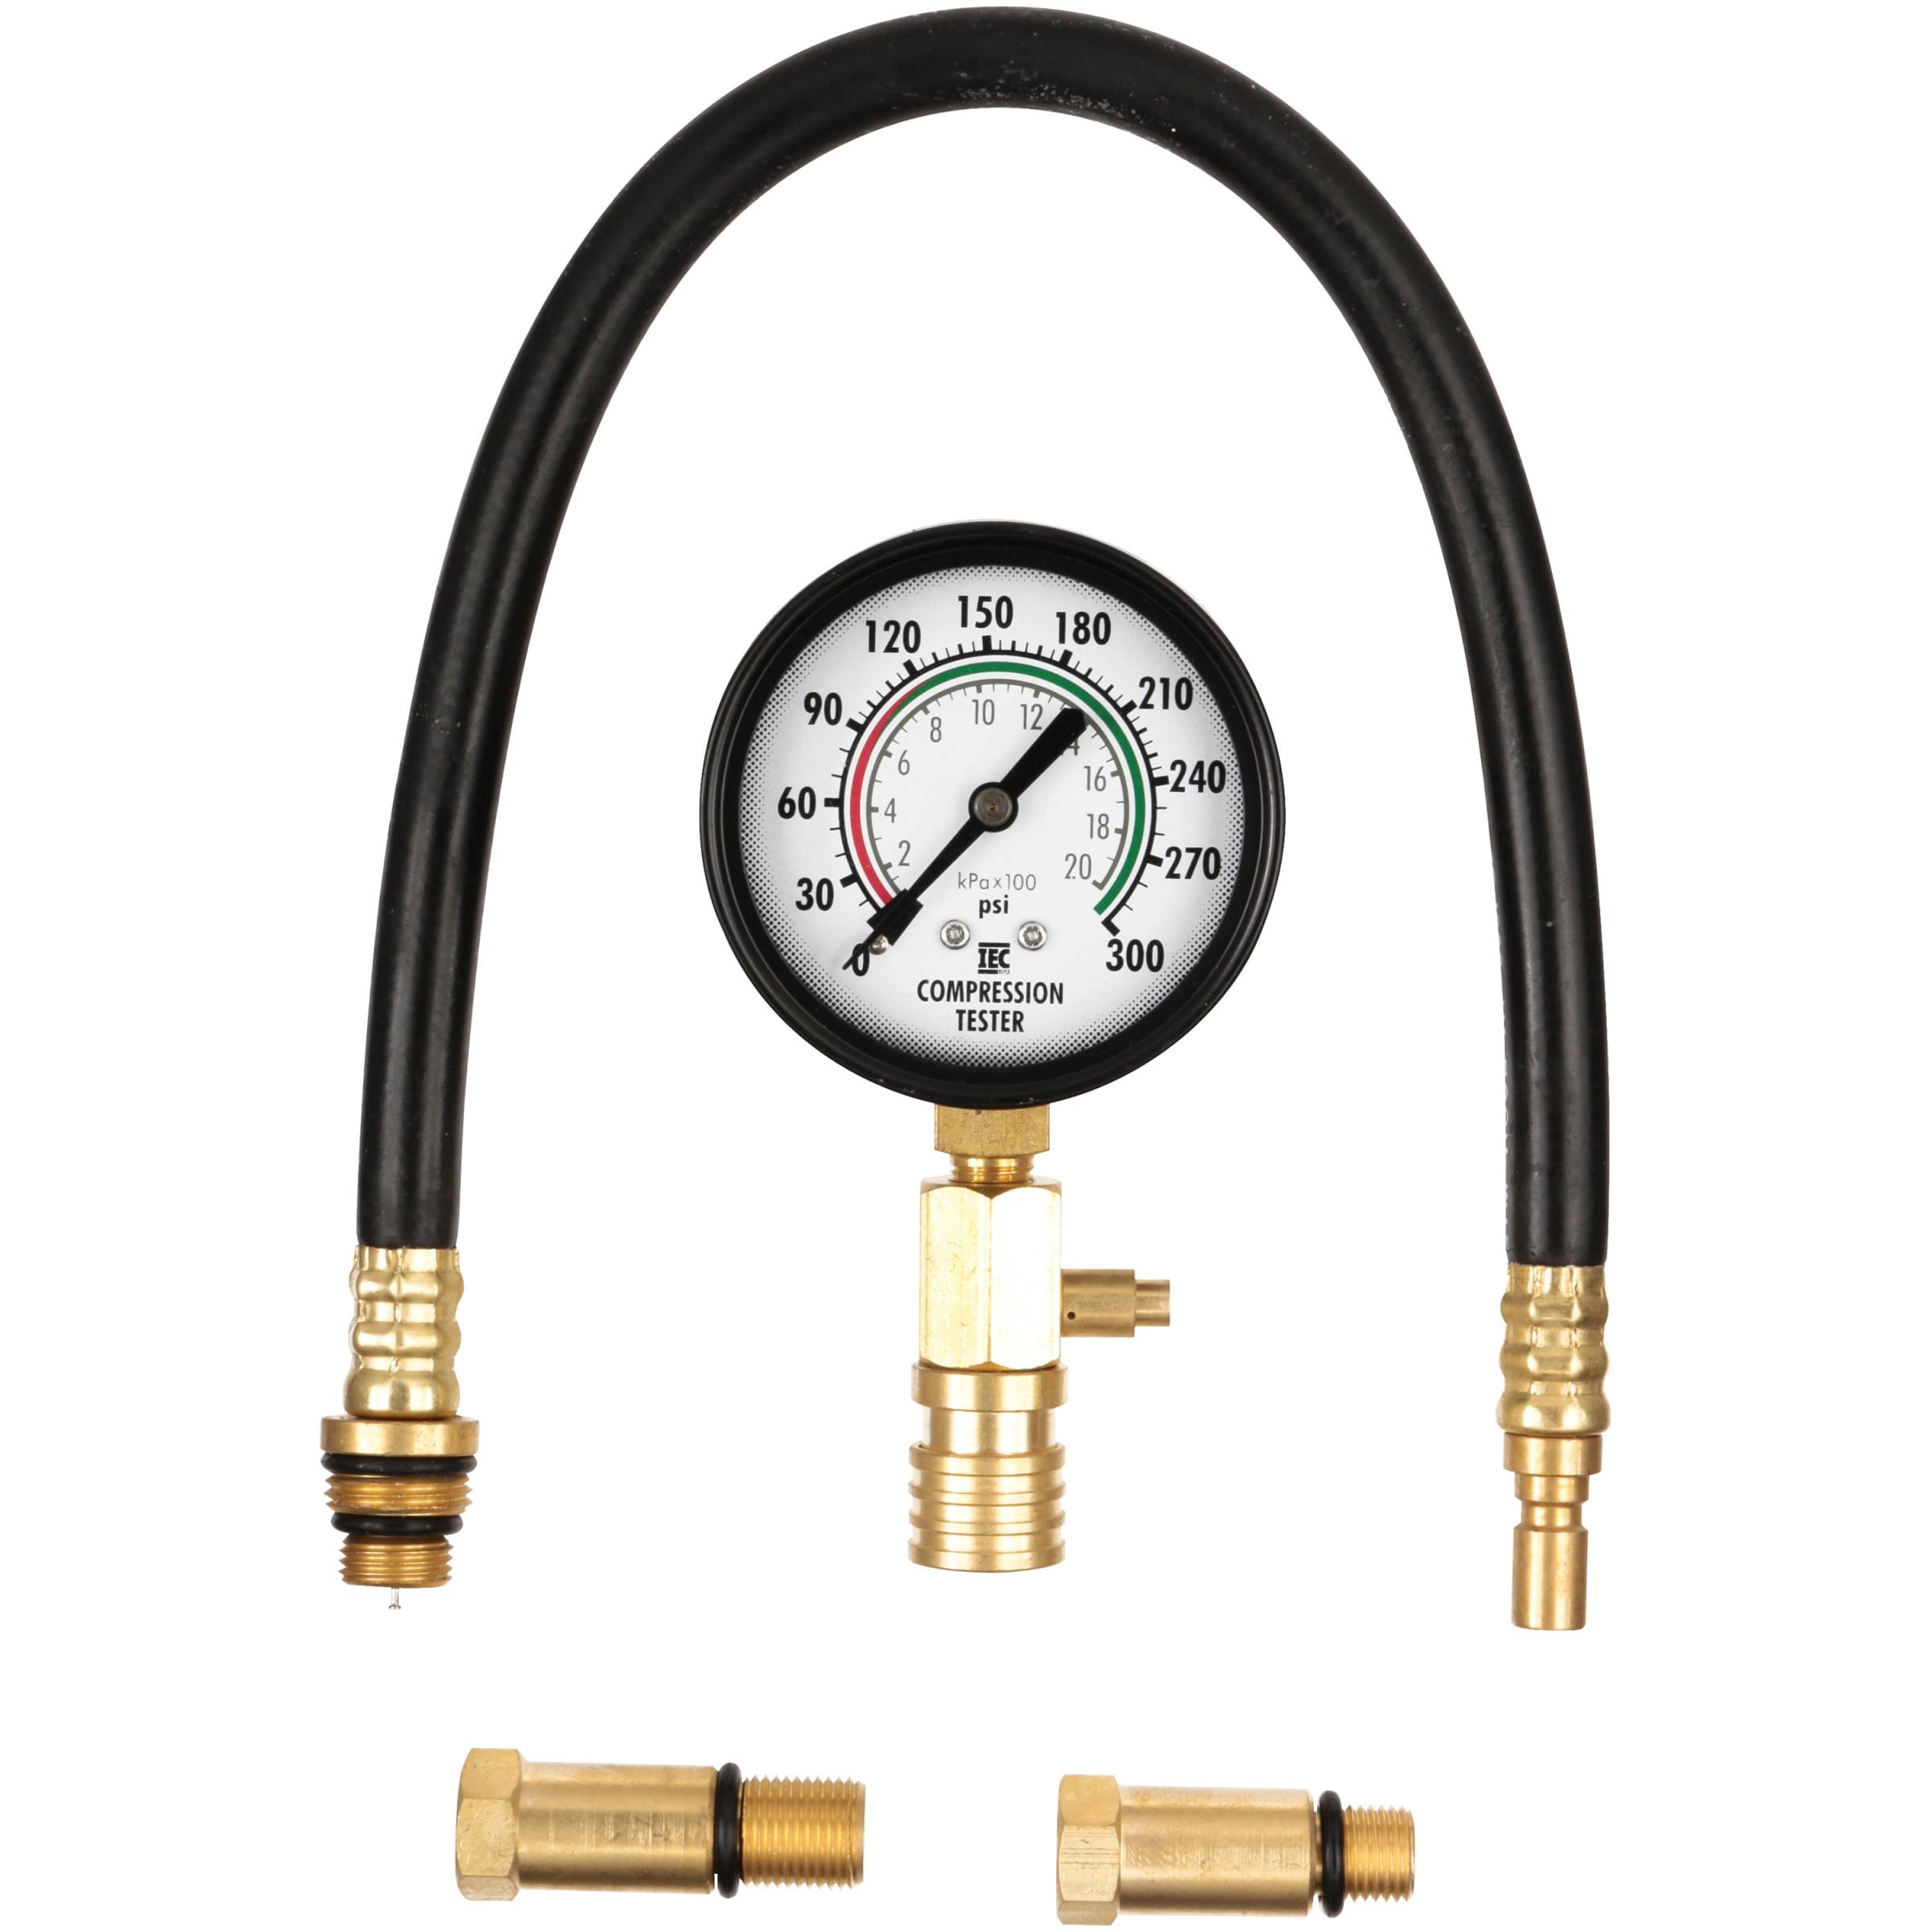 Innova® 3612 Compression Tester